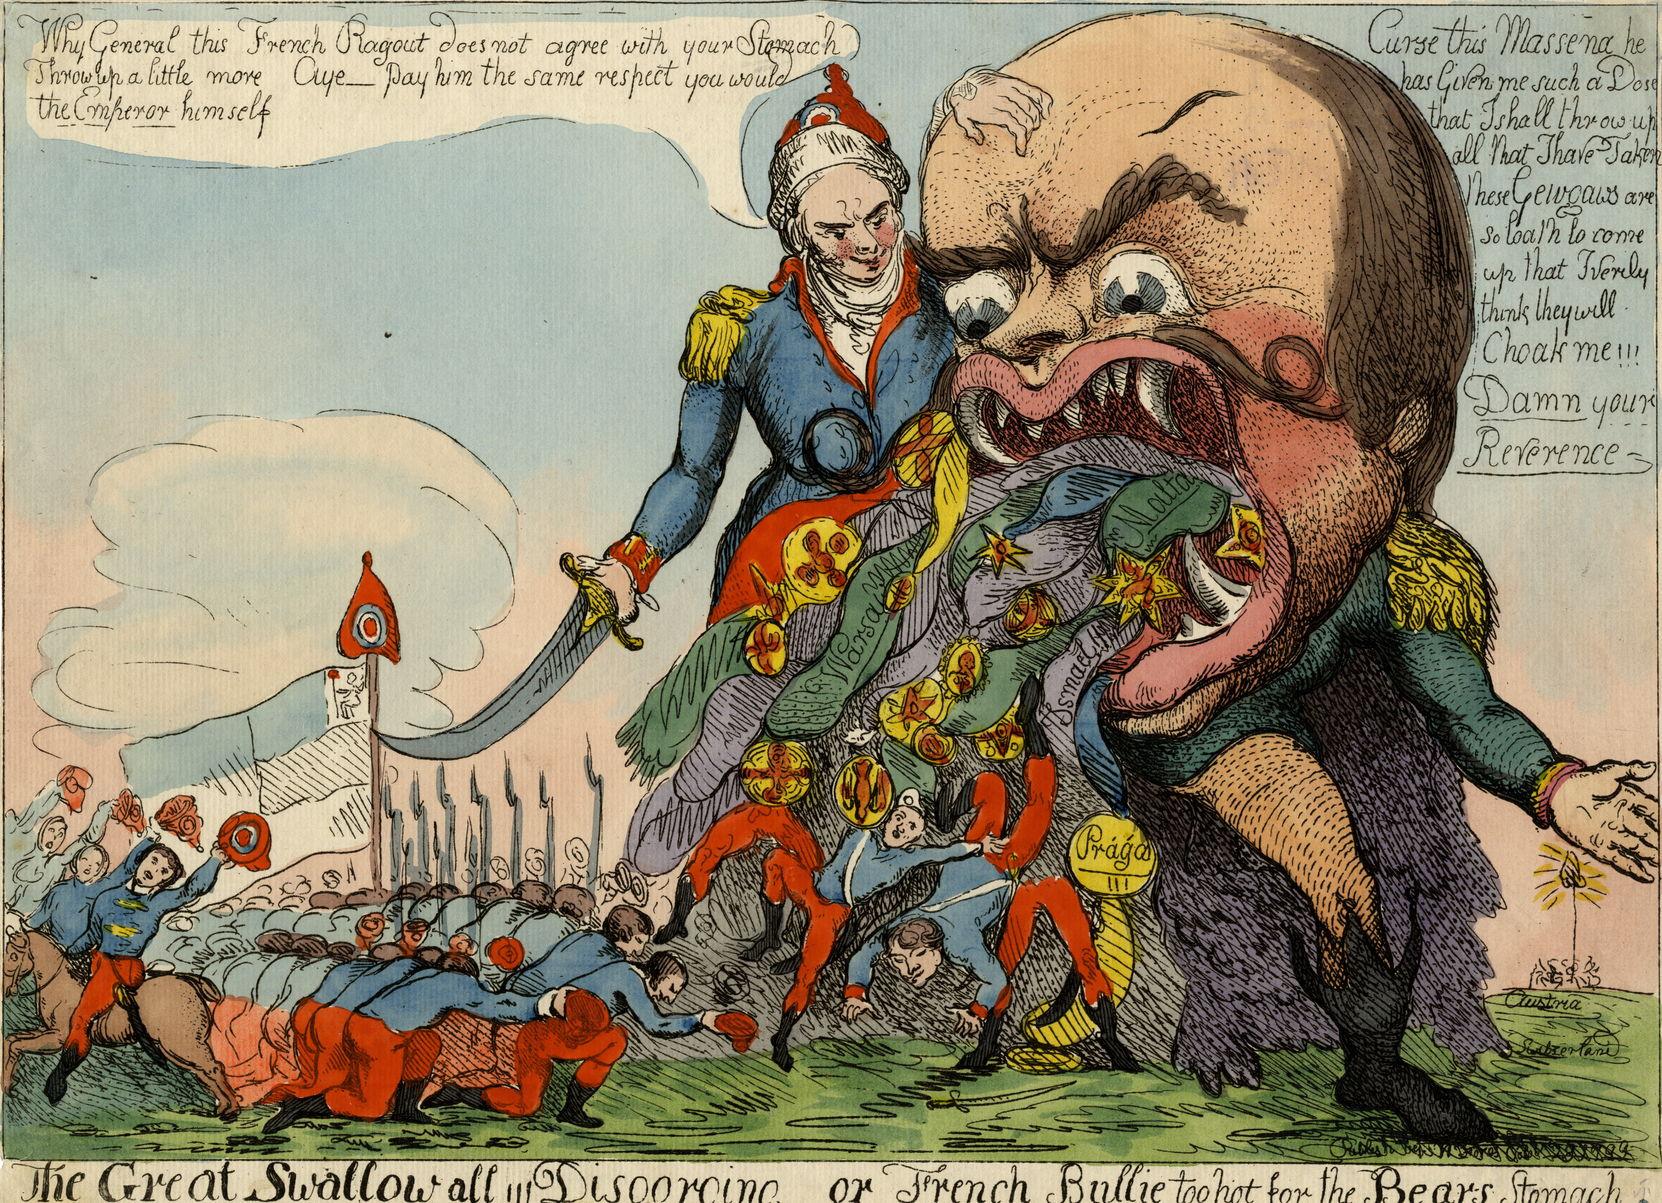 Джон Коуз Карикатура на А.В. Суворова. «The great Swallow all!!! Disgorging or French bullie too hot for the bears stomach». 1799 г. Бумага верже, офорт, акварель